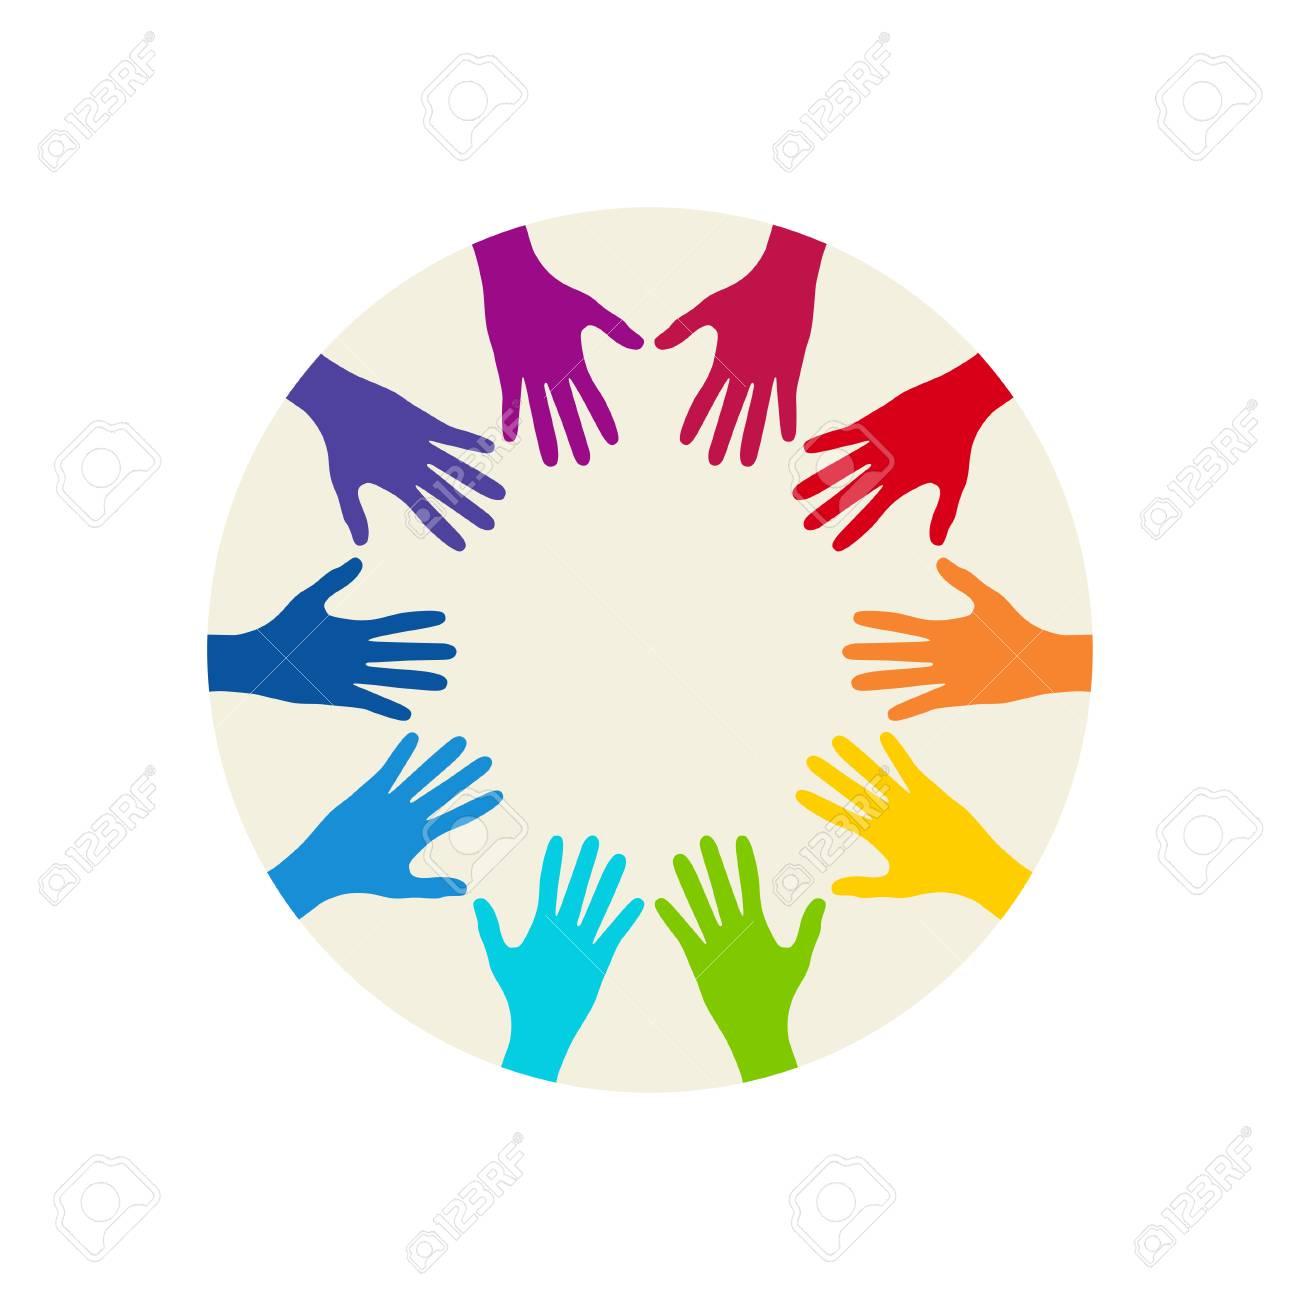 people colorful hands united together illustration of teamwork rh 123rf com Open Hands Vector Hand Gestures Vector